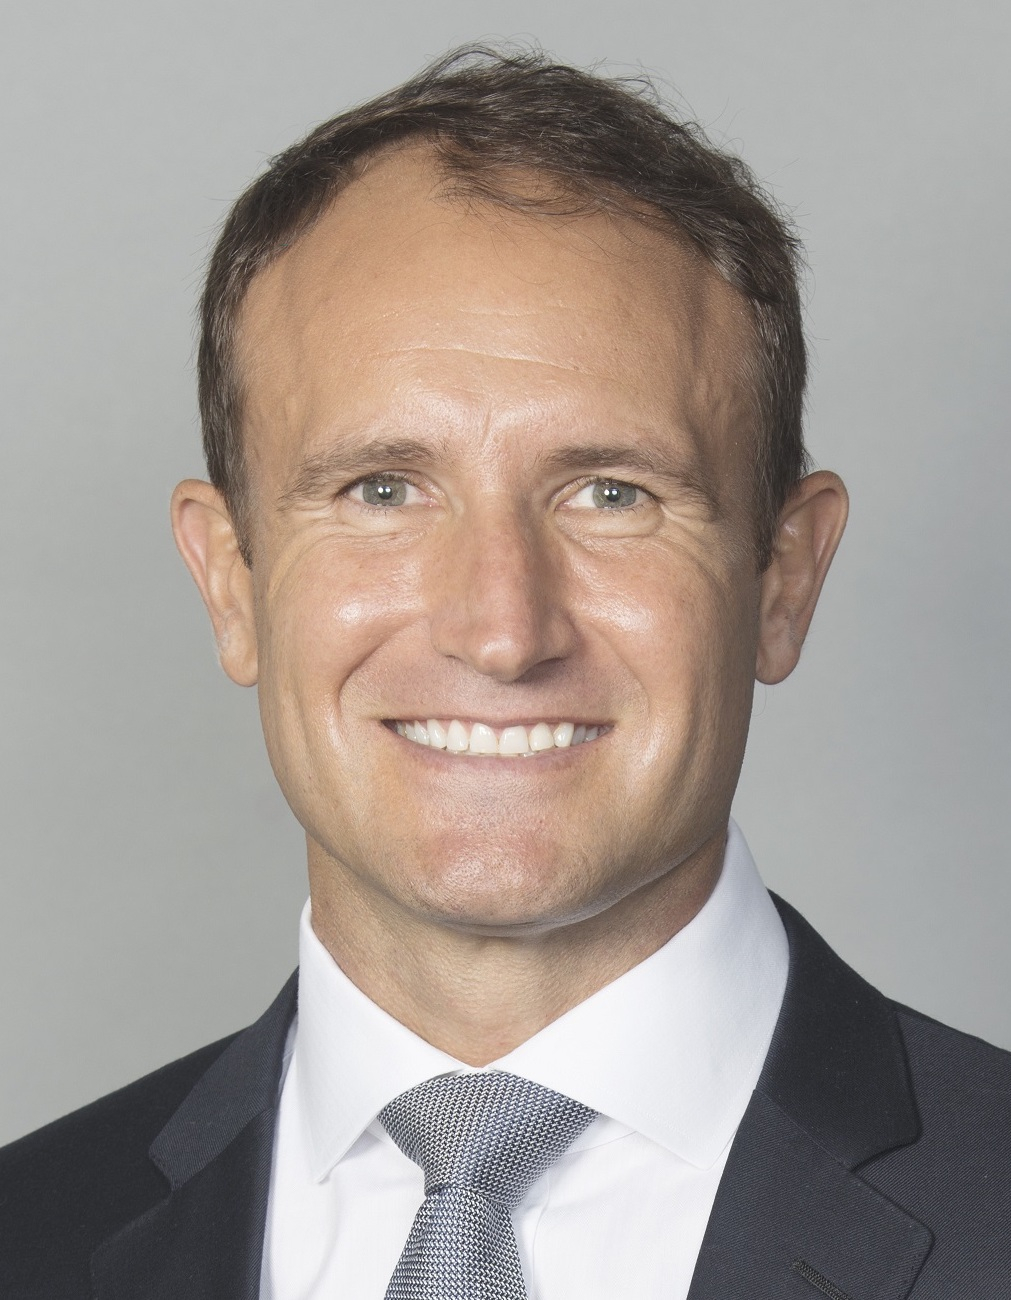 HSBC Antony Shaw Headshot